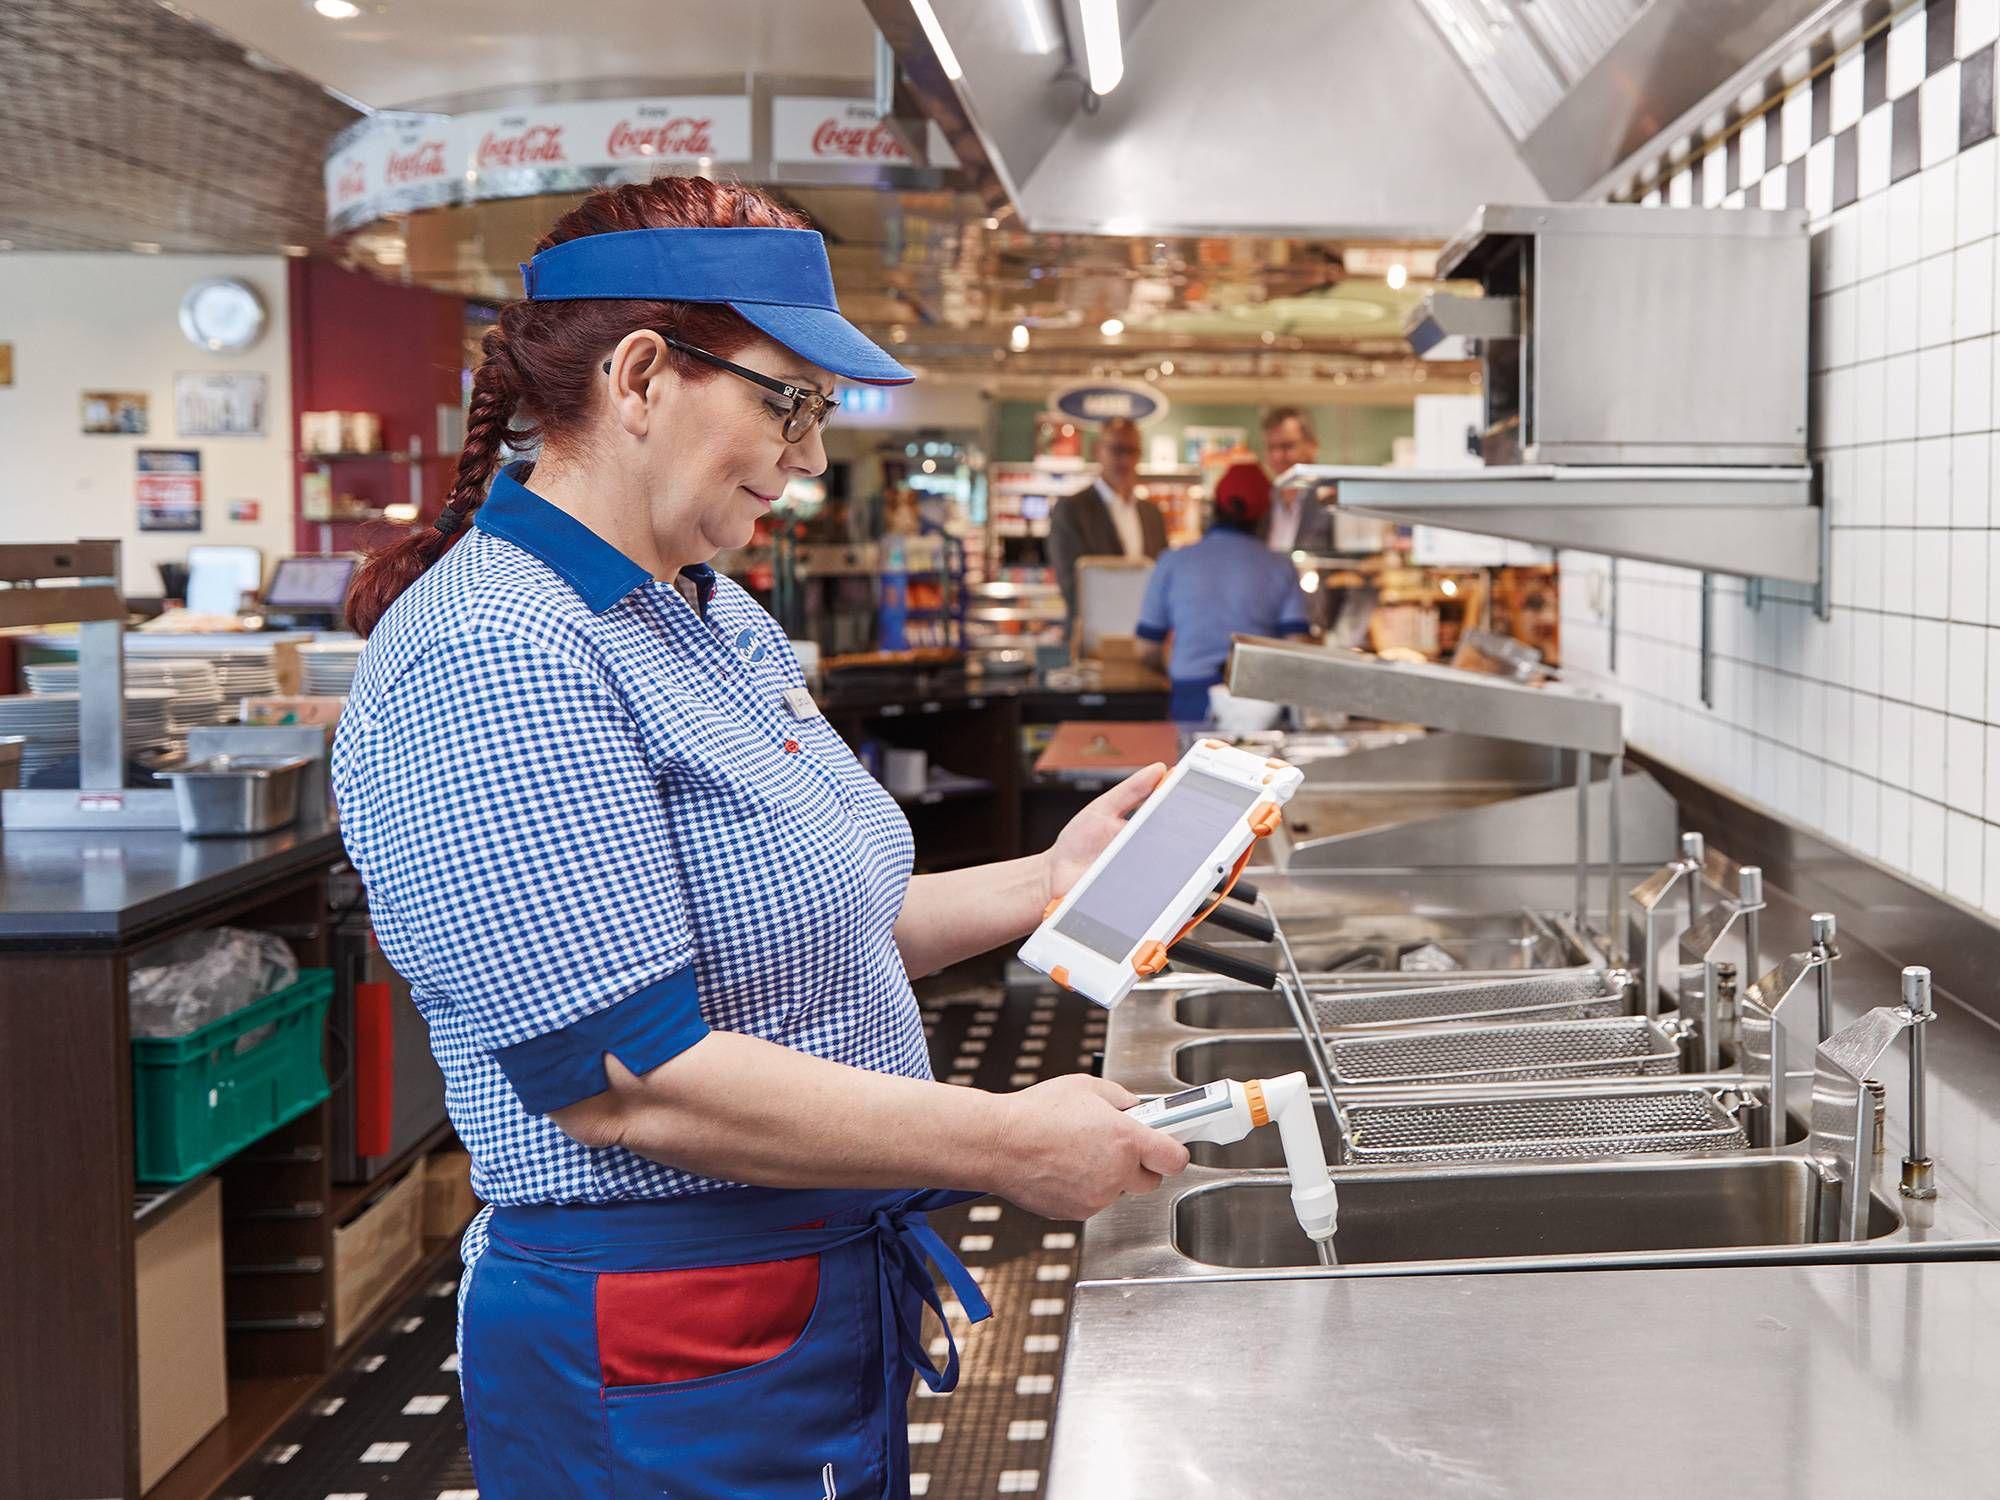 Restaurant cooking oil measurement